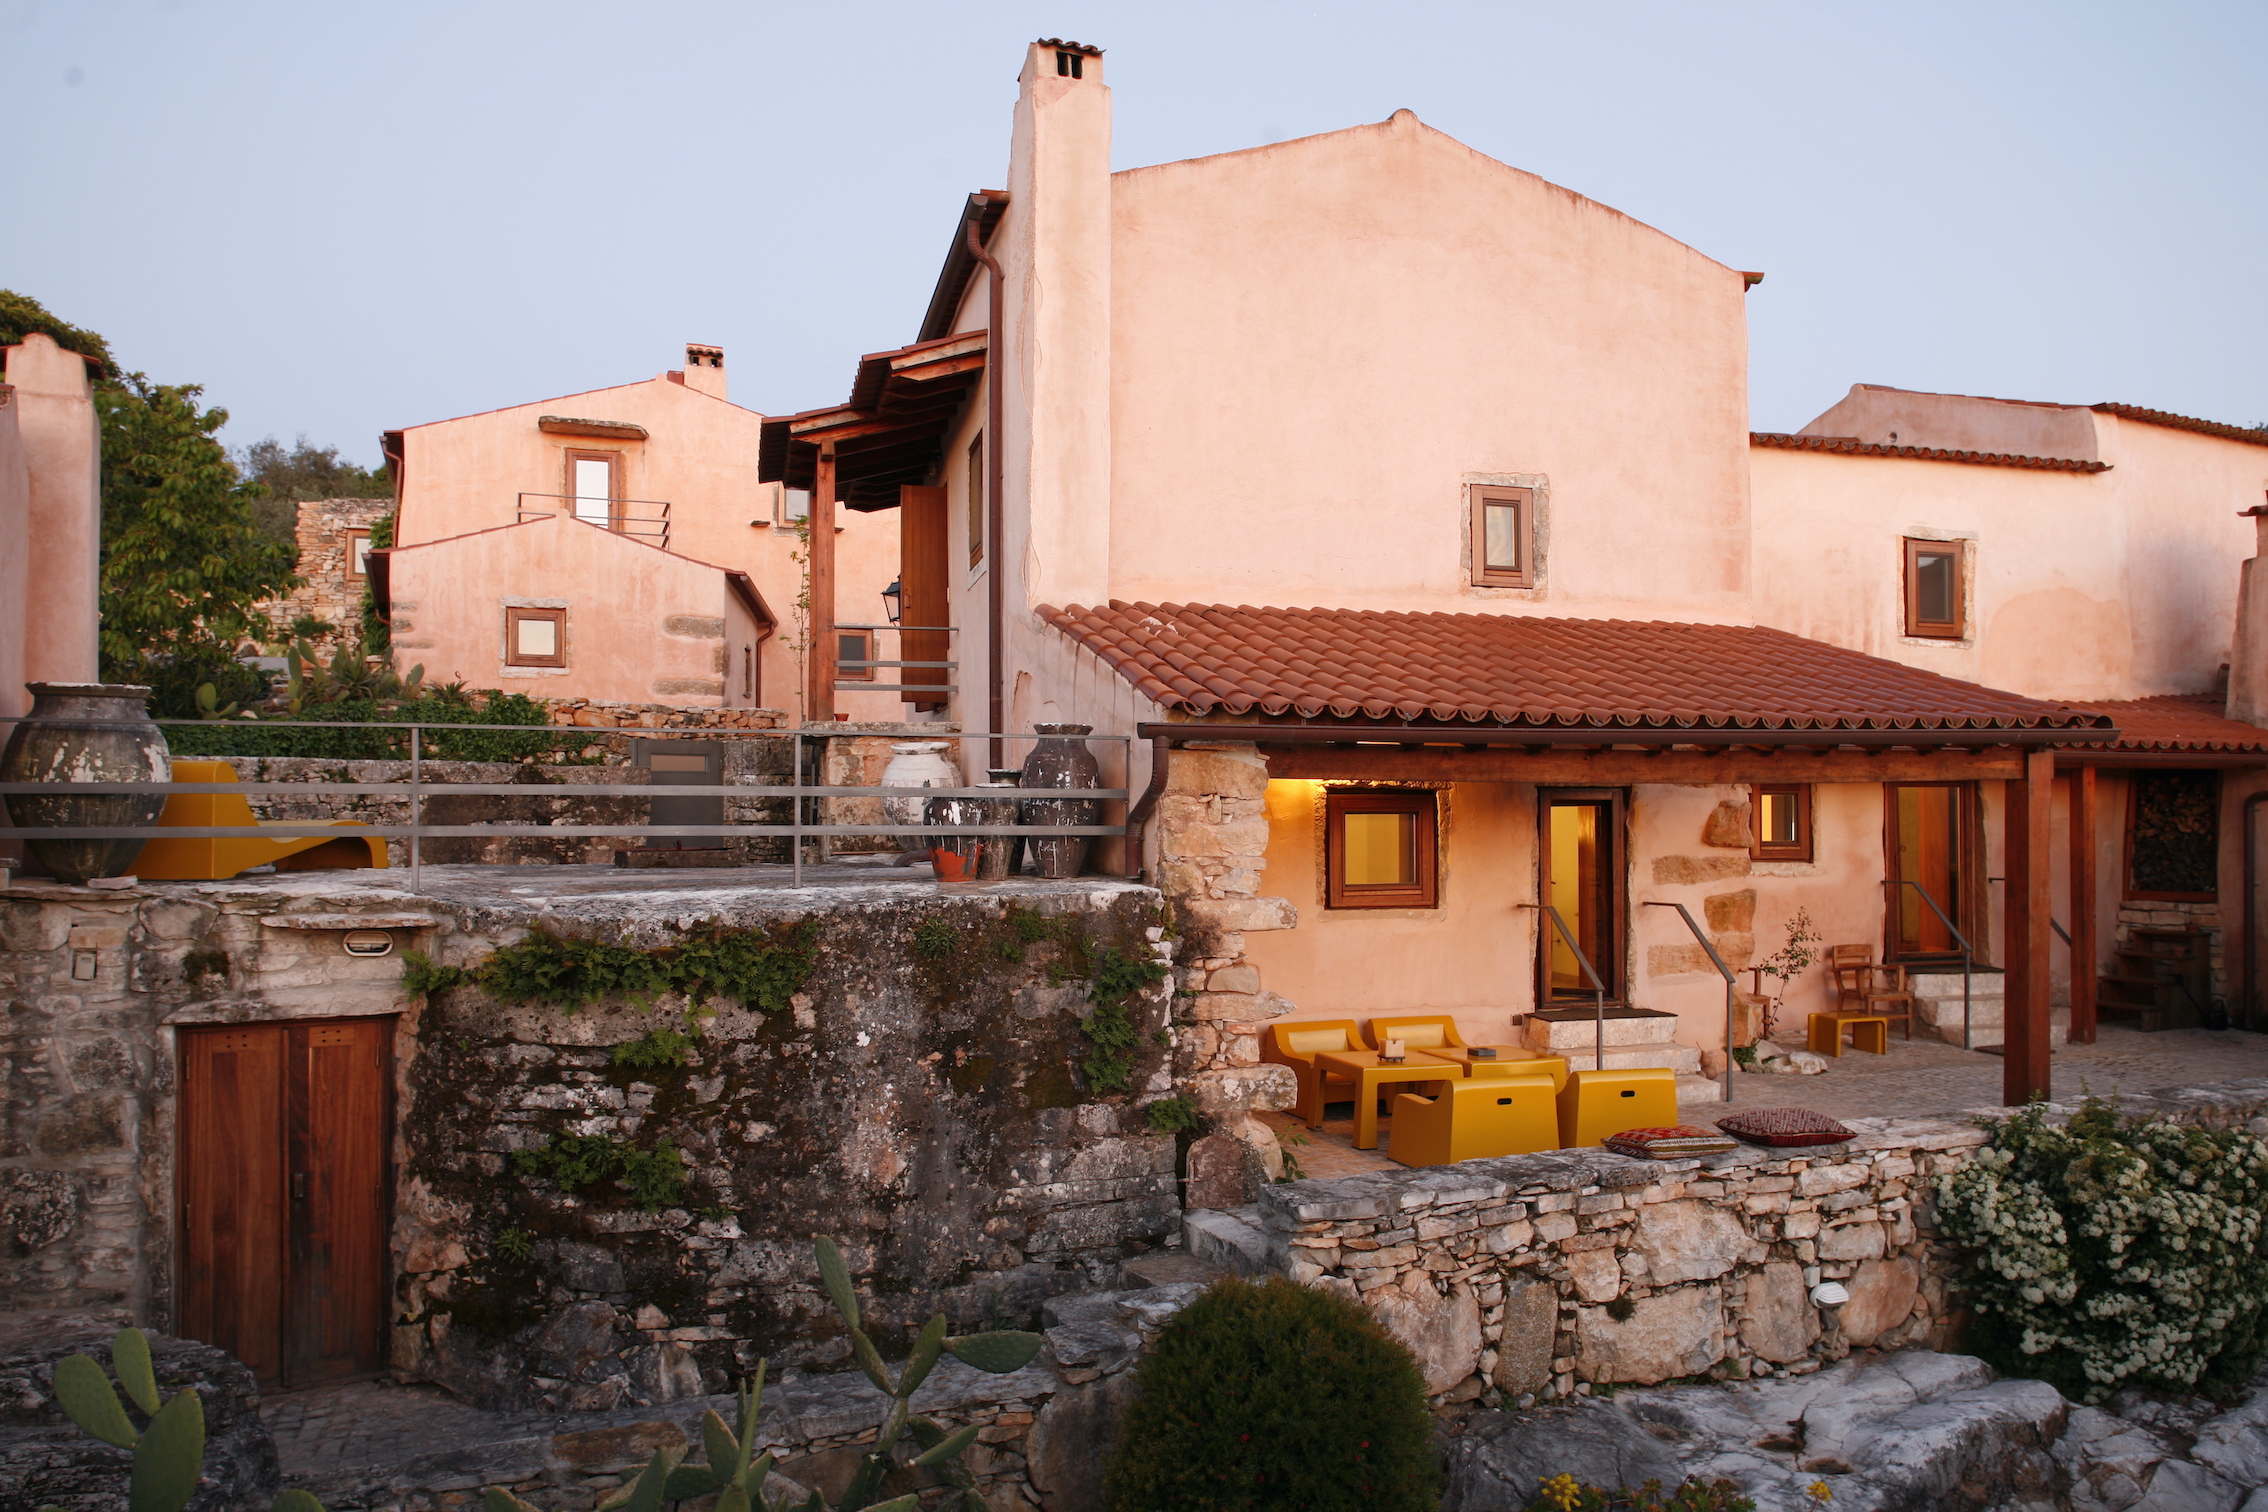 Um turismo rural localizado na encosta da Serra de Sicó (Coimbra) / Carlos Cezanne